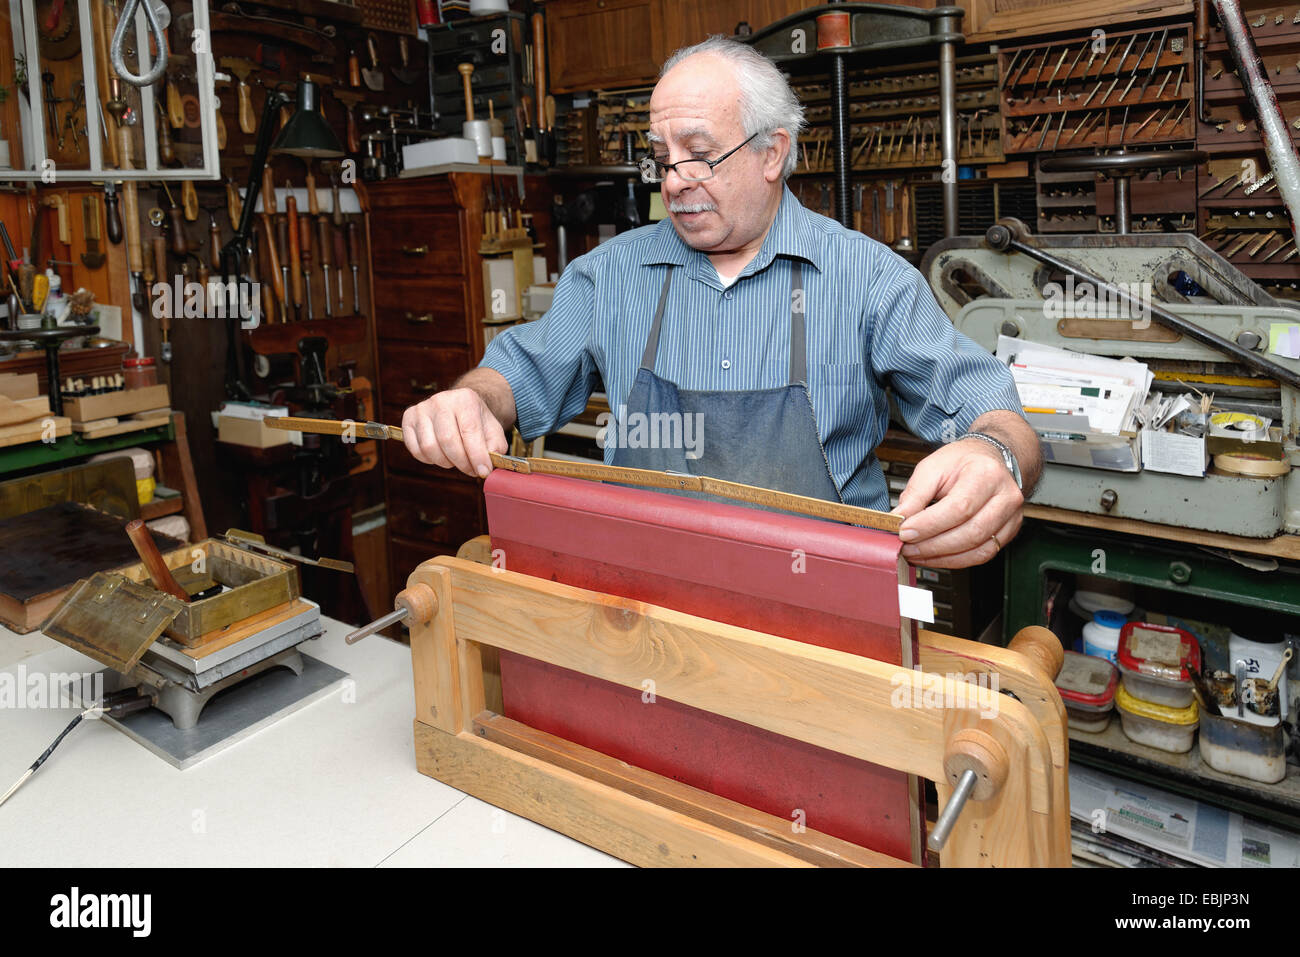 Senior man measuring book spine in traditional bookbinding workshop - Stock Image